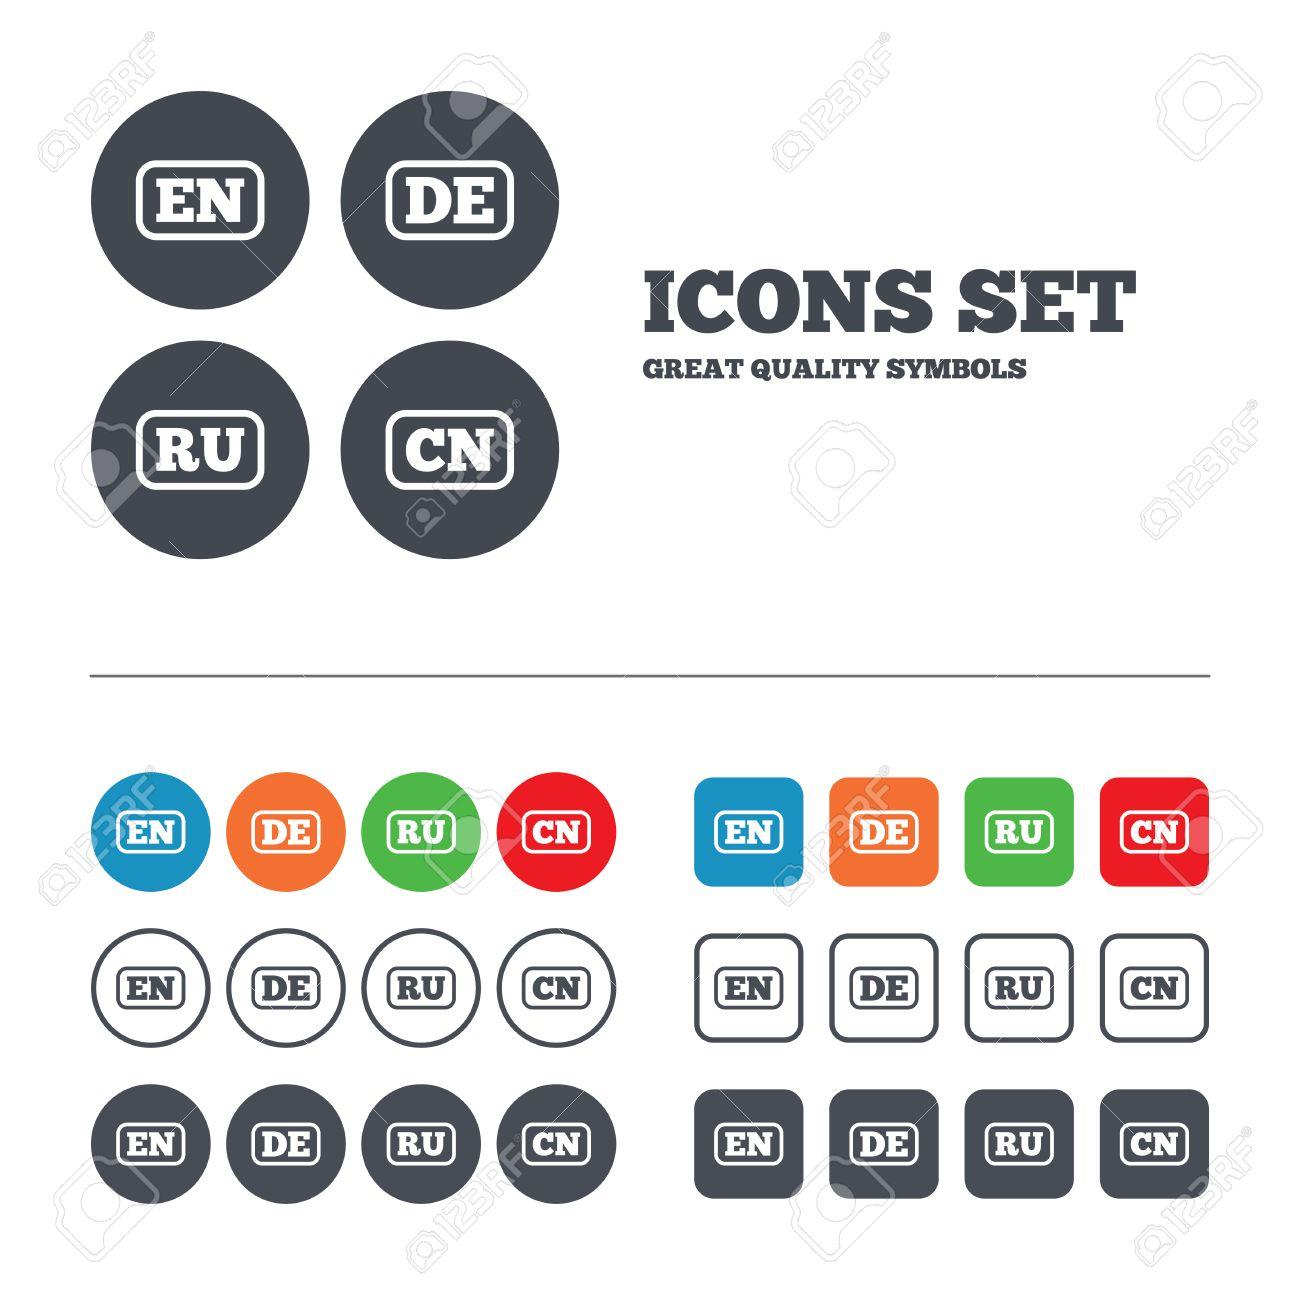 Language icons en de ru and cn translation symbols english en de ru and cn translation symbols english german buycottarizona Image collections